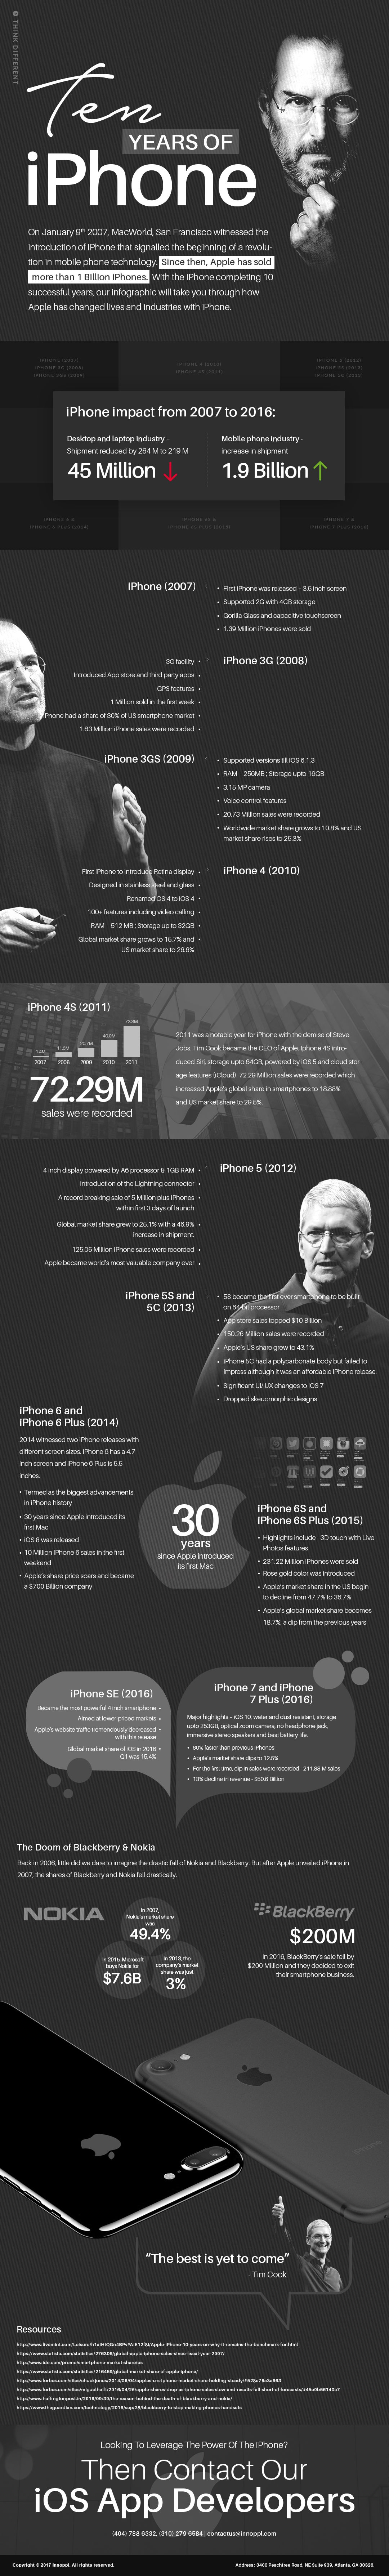 Ten Years Of iPhone Infographic Infographic, Iphones